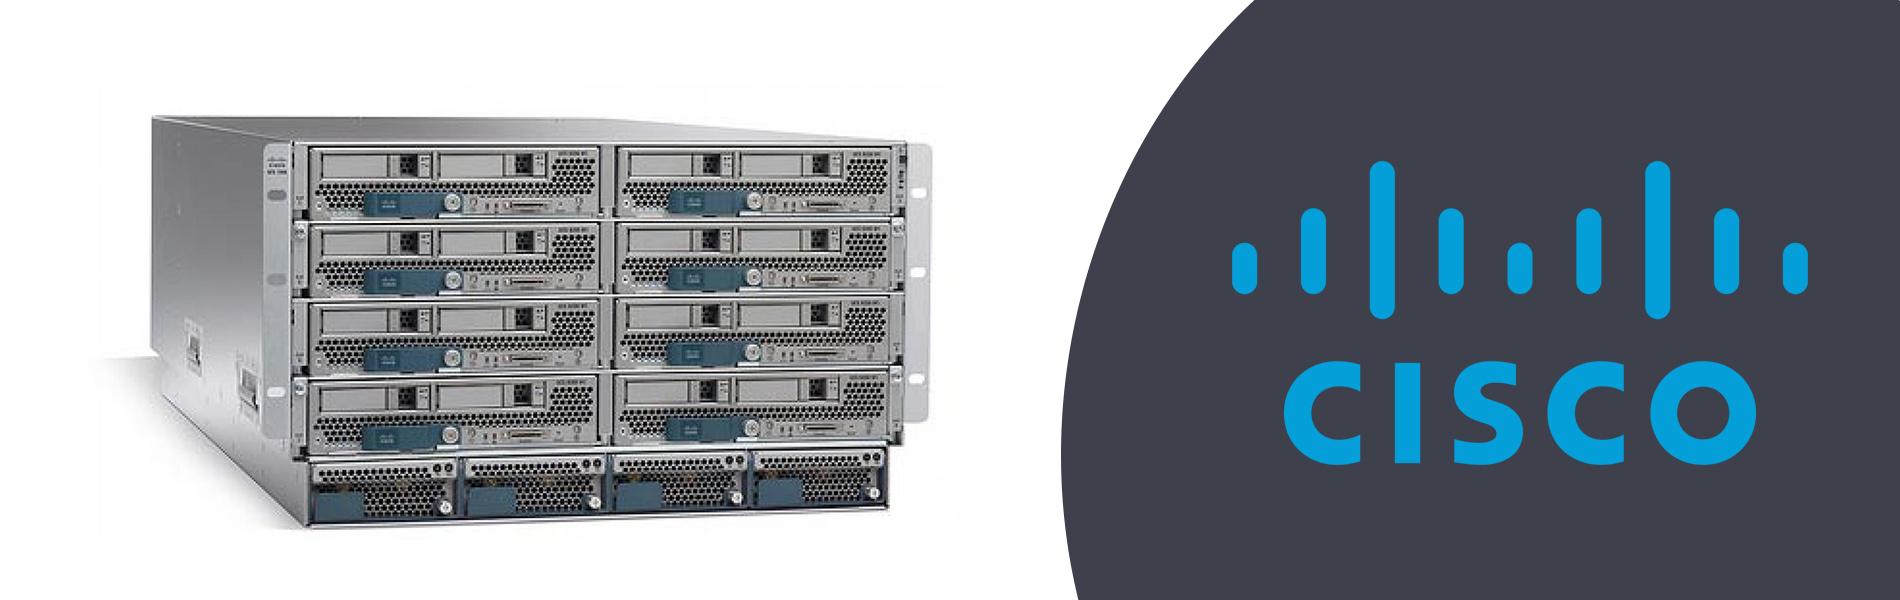 ICT Solution – Cisco Server